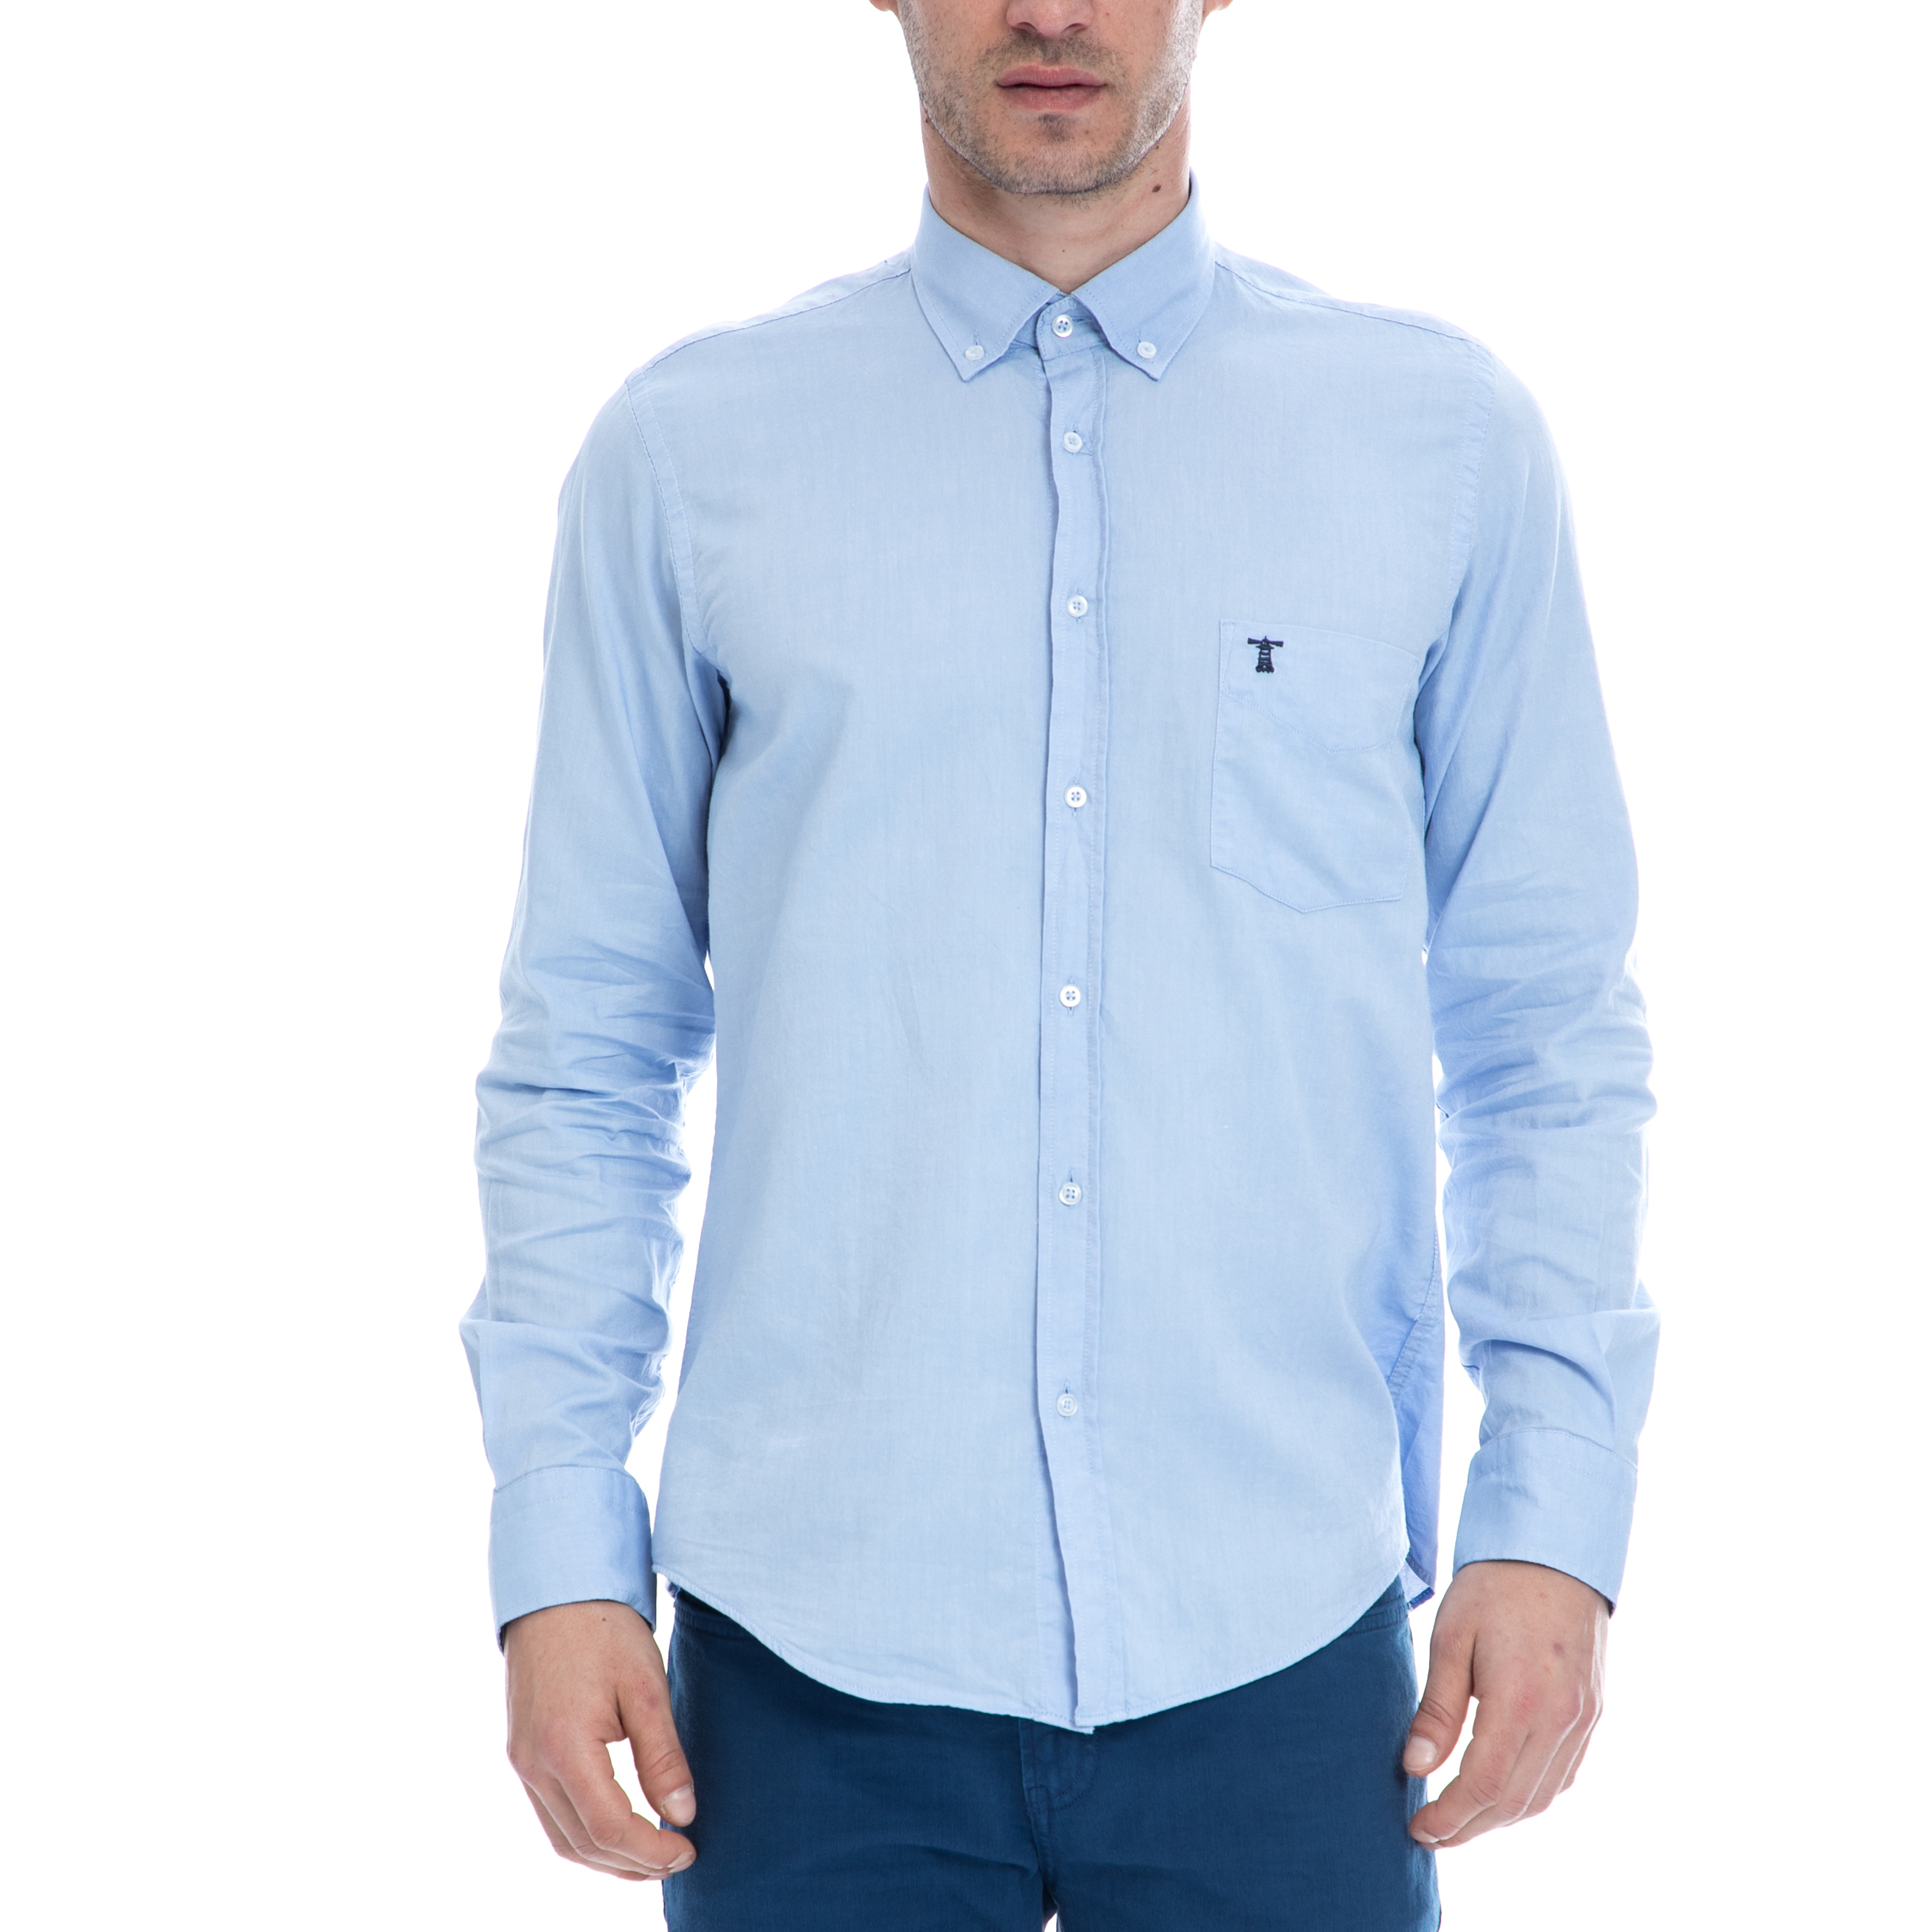 HAMPTONS - Ανδρικό πουκάμισο HAMPTONS γαλάζιο μακρυμάνικο